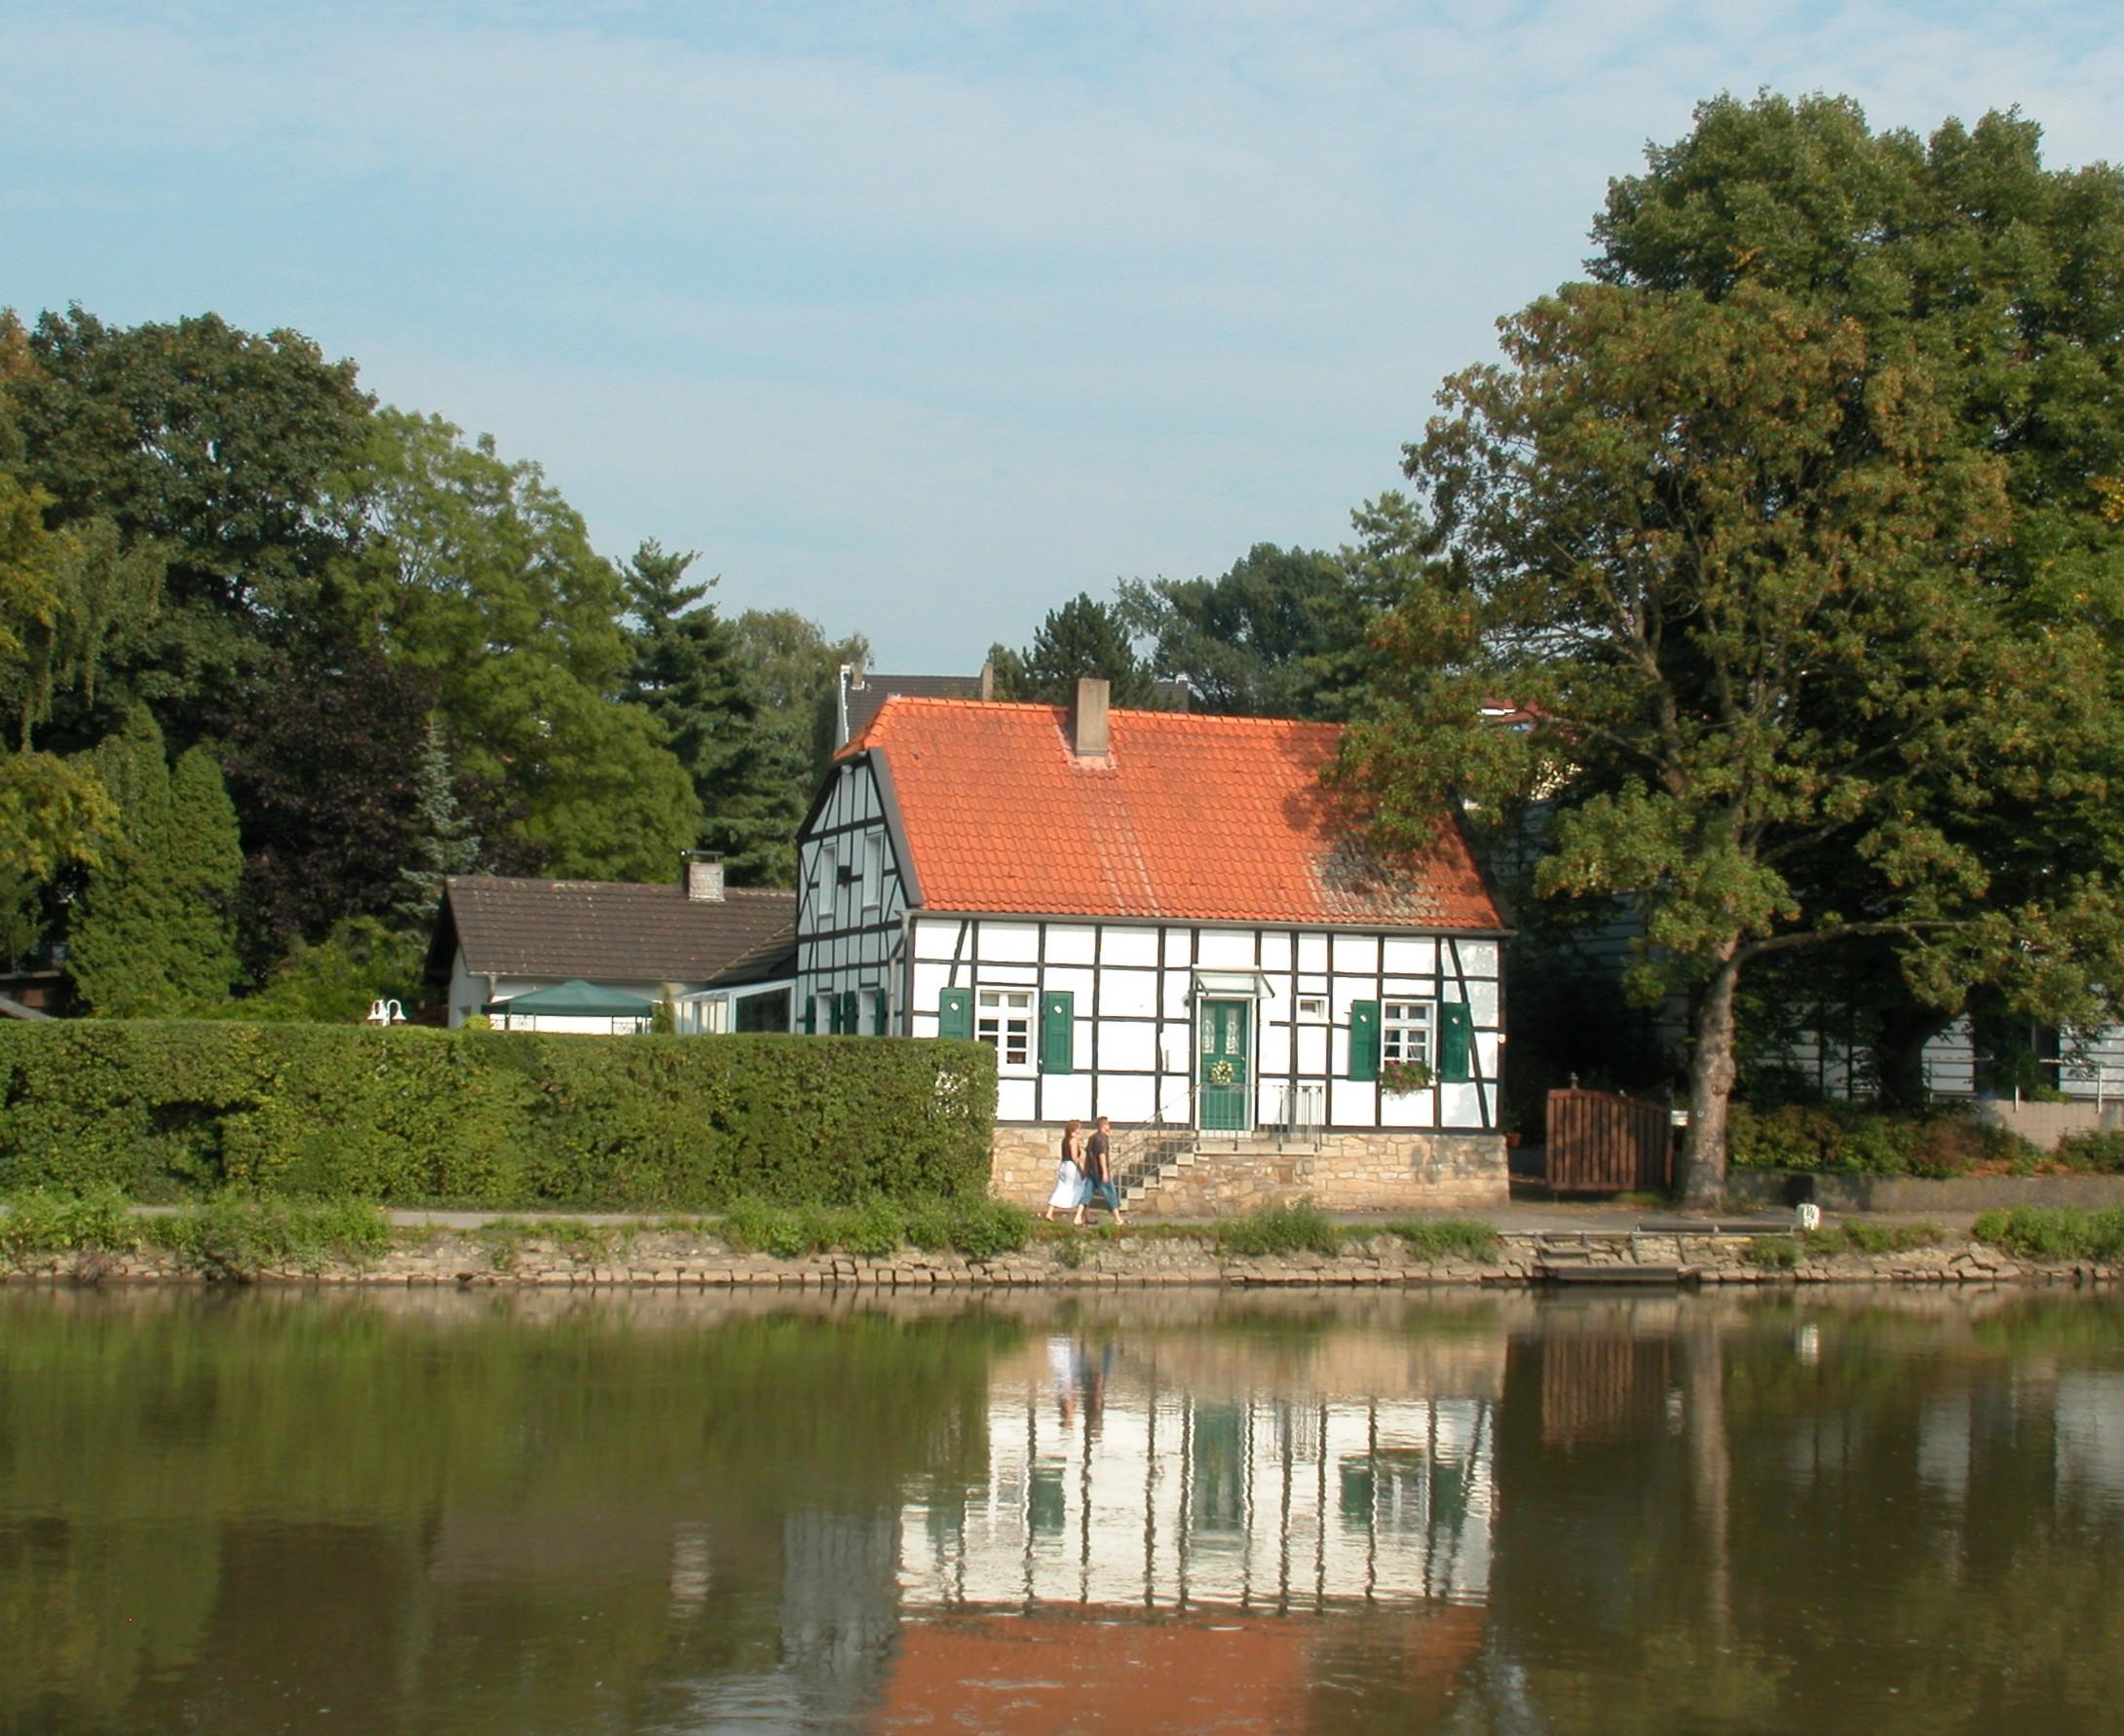 Ehemalige - English translation - German-English dictionary